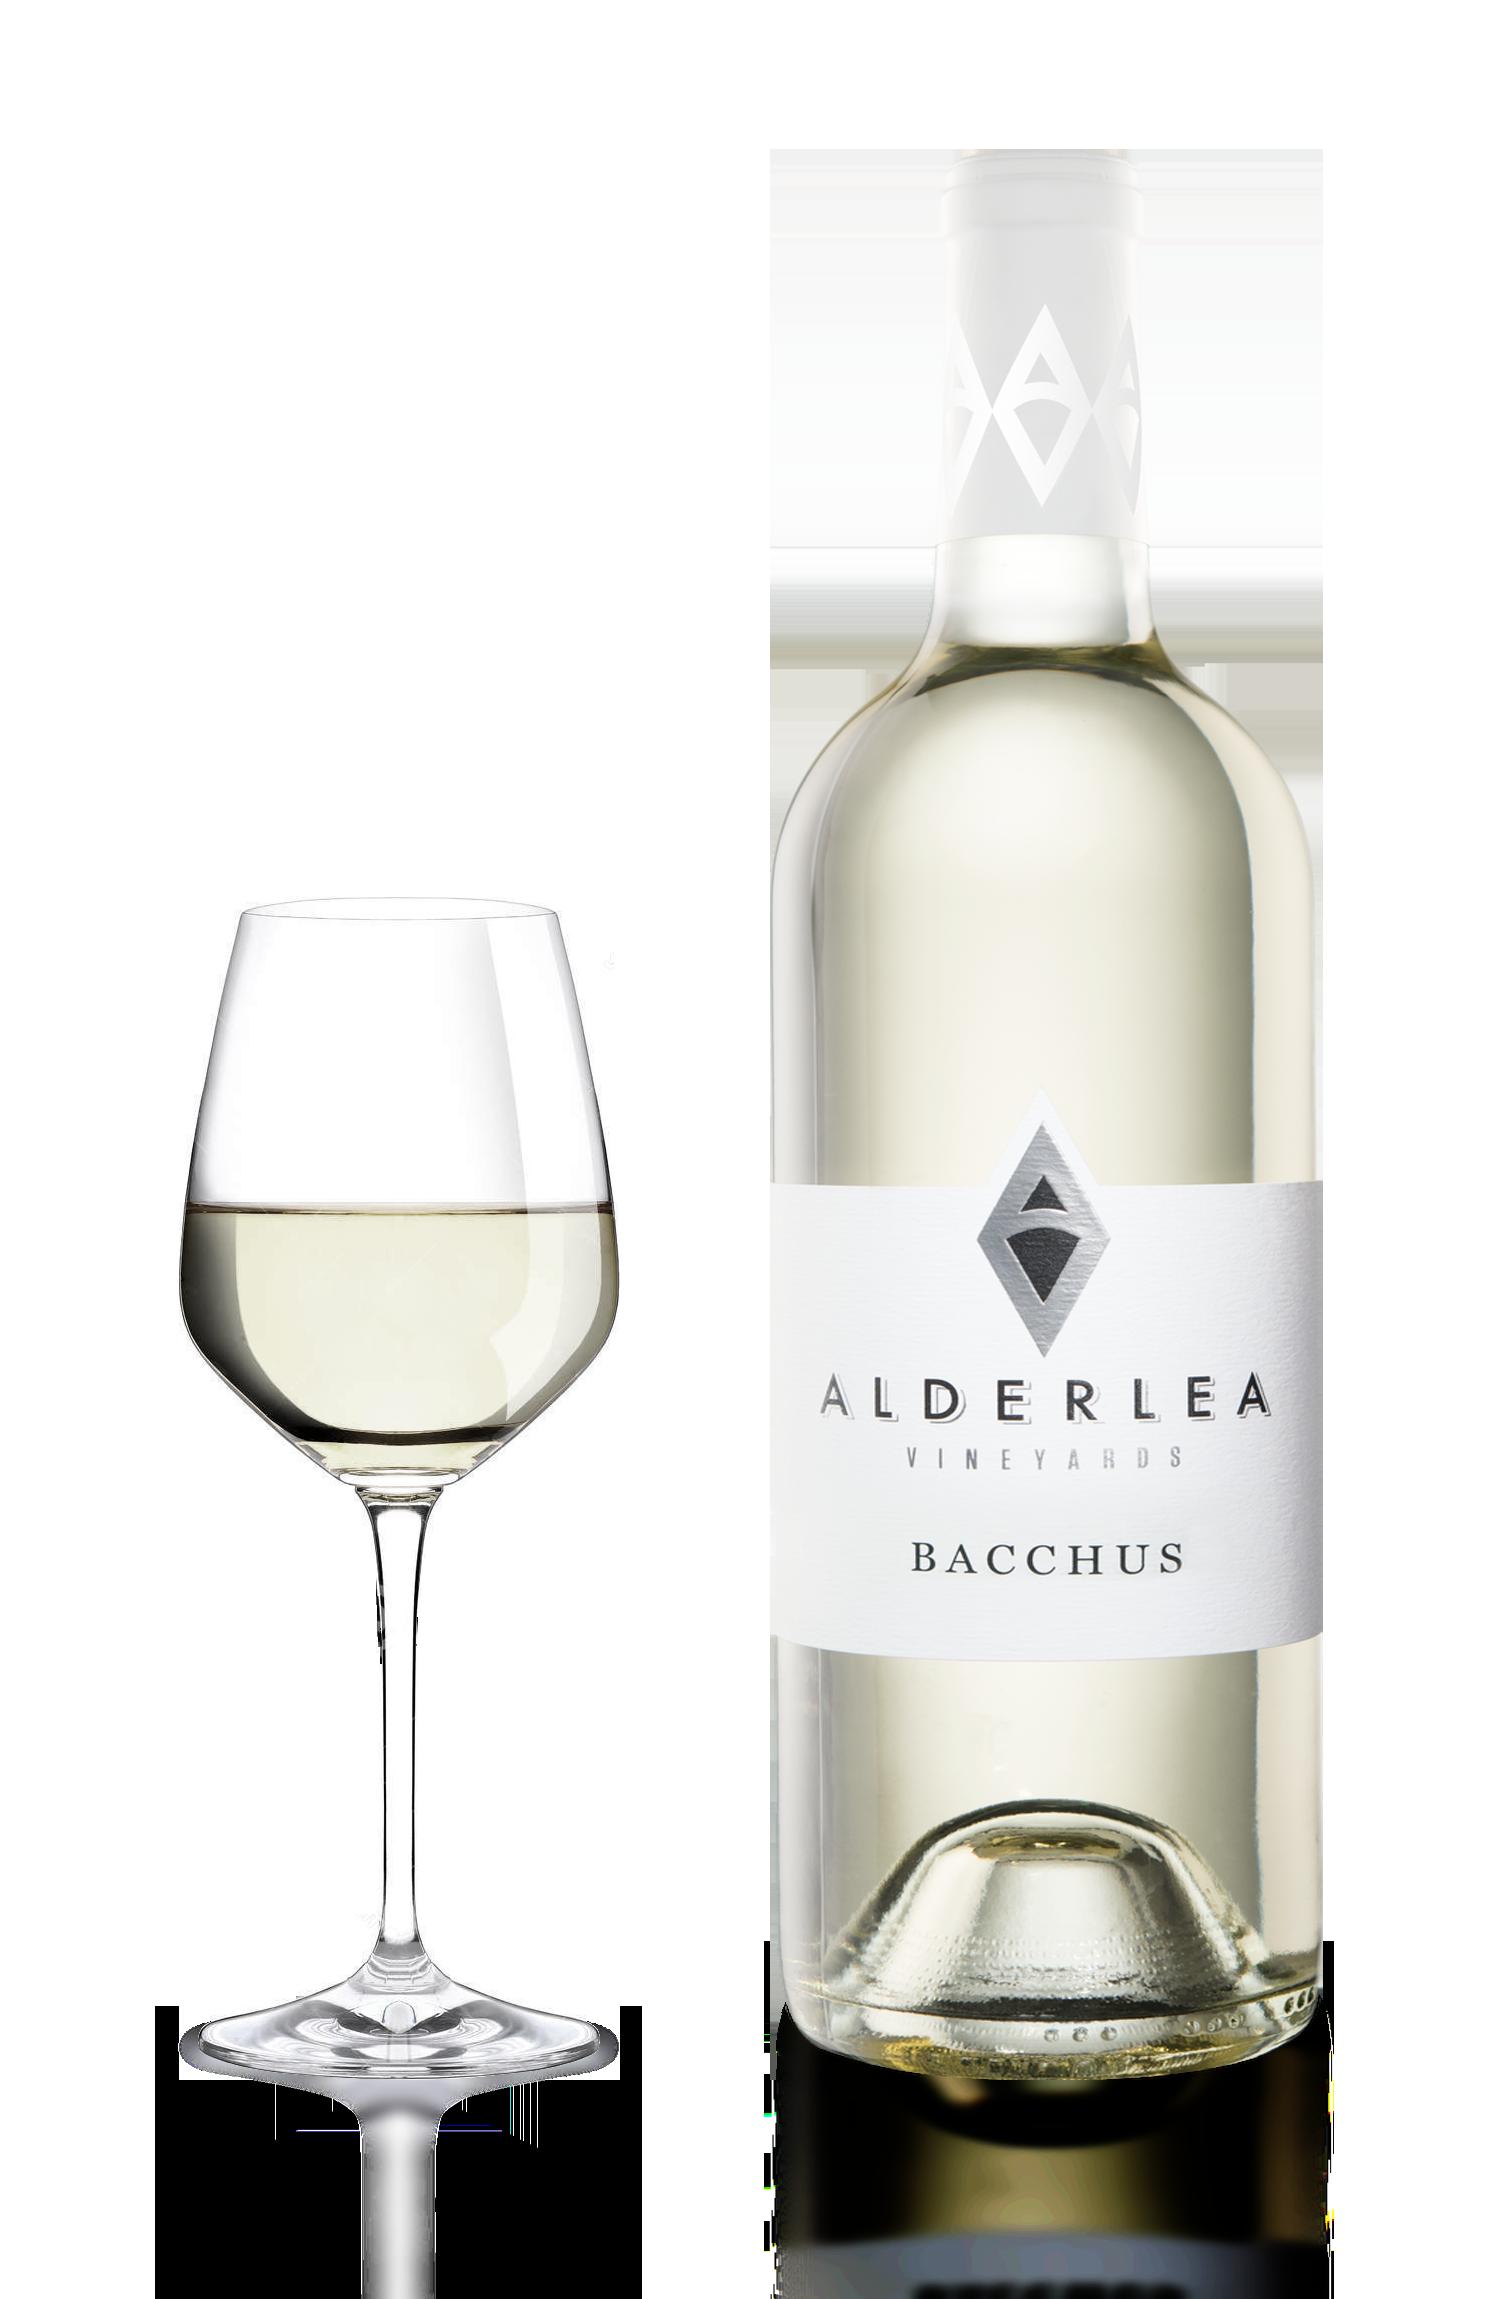 Alderlea Bacchus